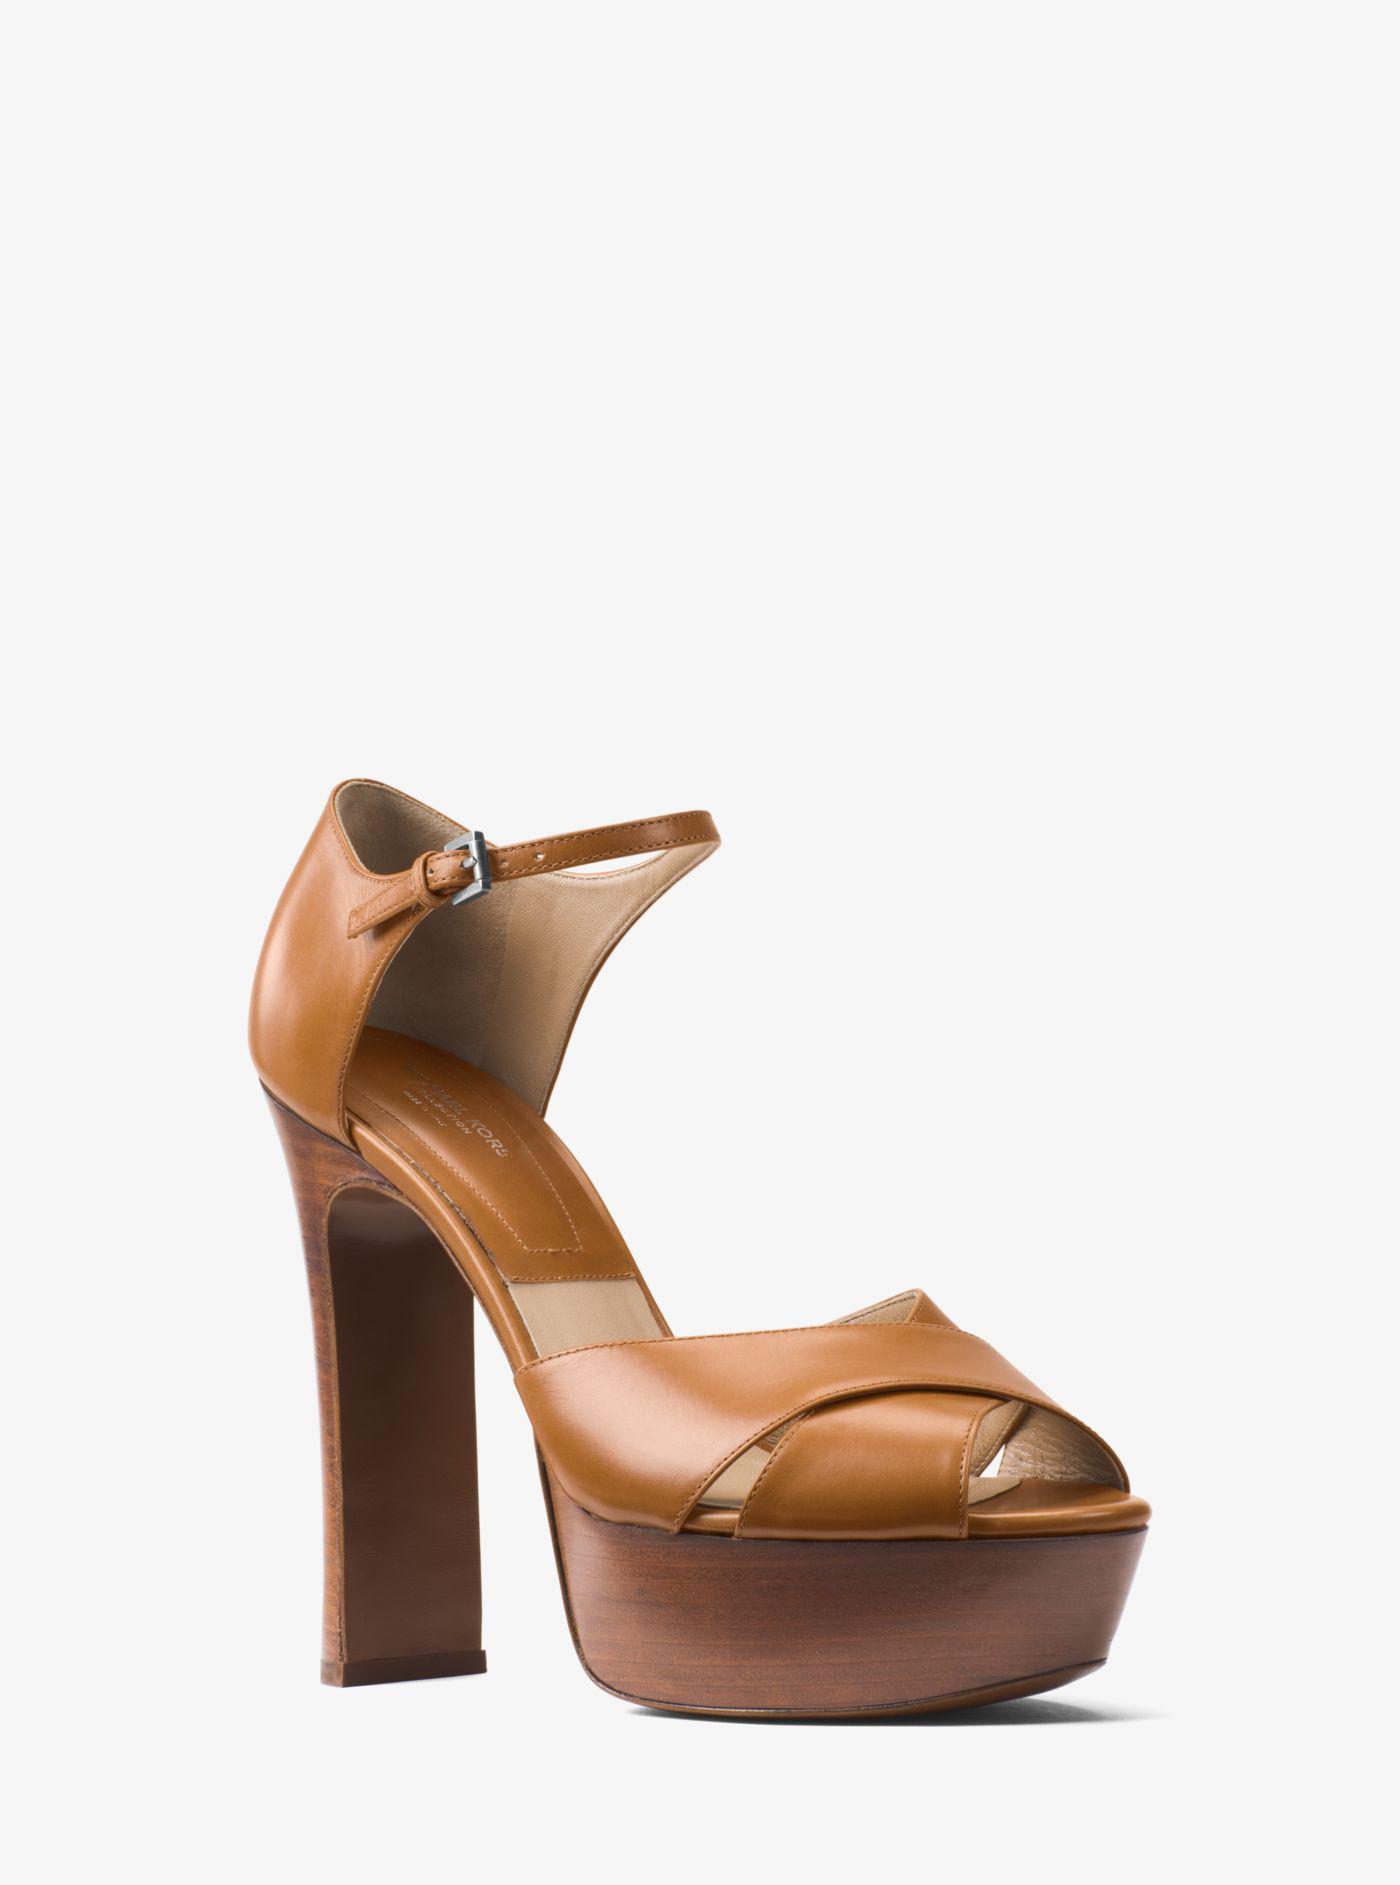 172cf6d3917e Michael Kors Huxley Leather Platform Sandal in Brown - Lyst